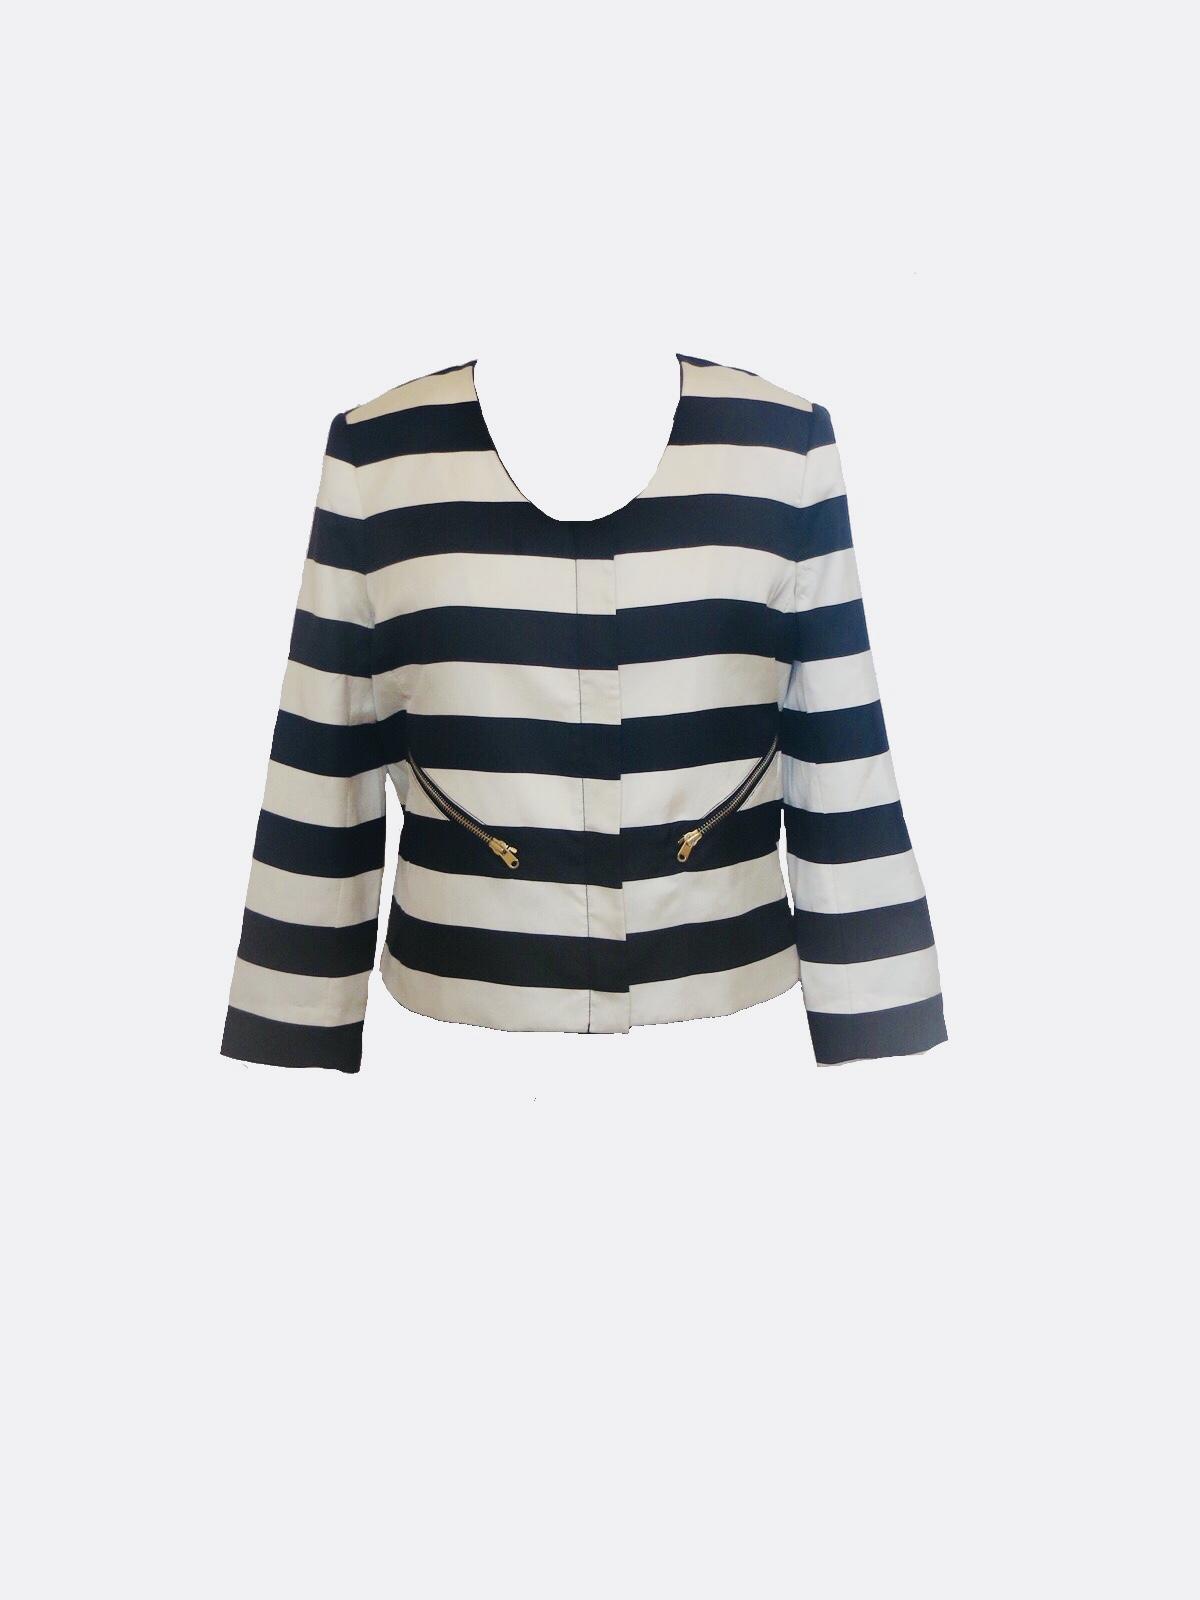 2bc88d5ea4 Size 10 Club Monaco Black And Cream Striped Jacket - Wooden Hanger